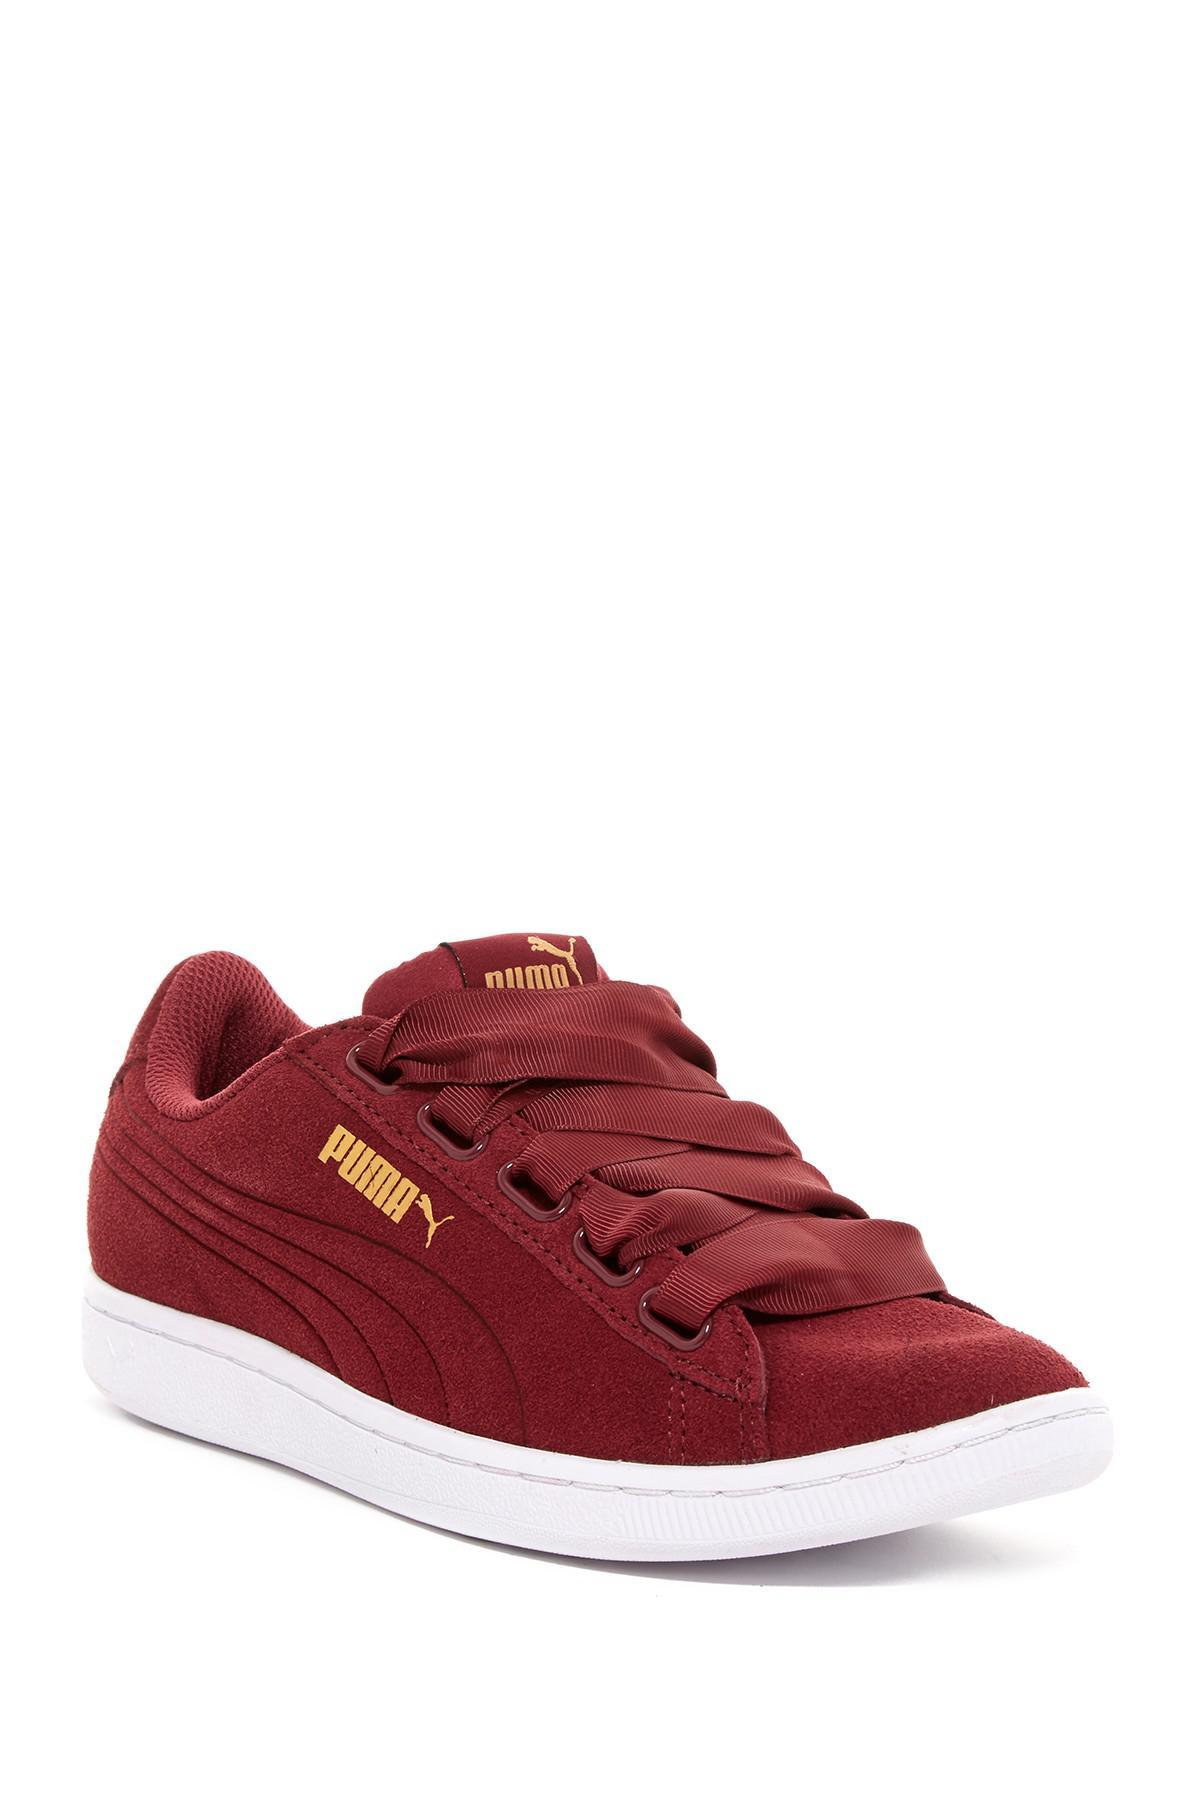 0afe29b3710 Lyst - Puma Vikky Ribbon Sneaker in Red Puma Vikky Platform Ribbon White ...